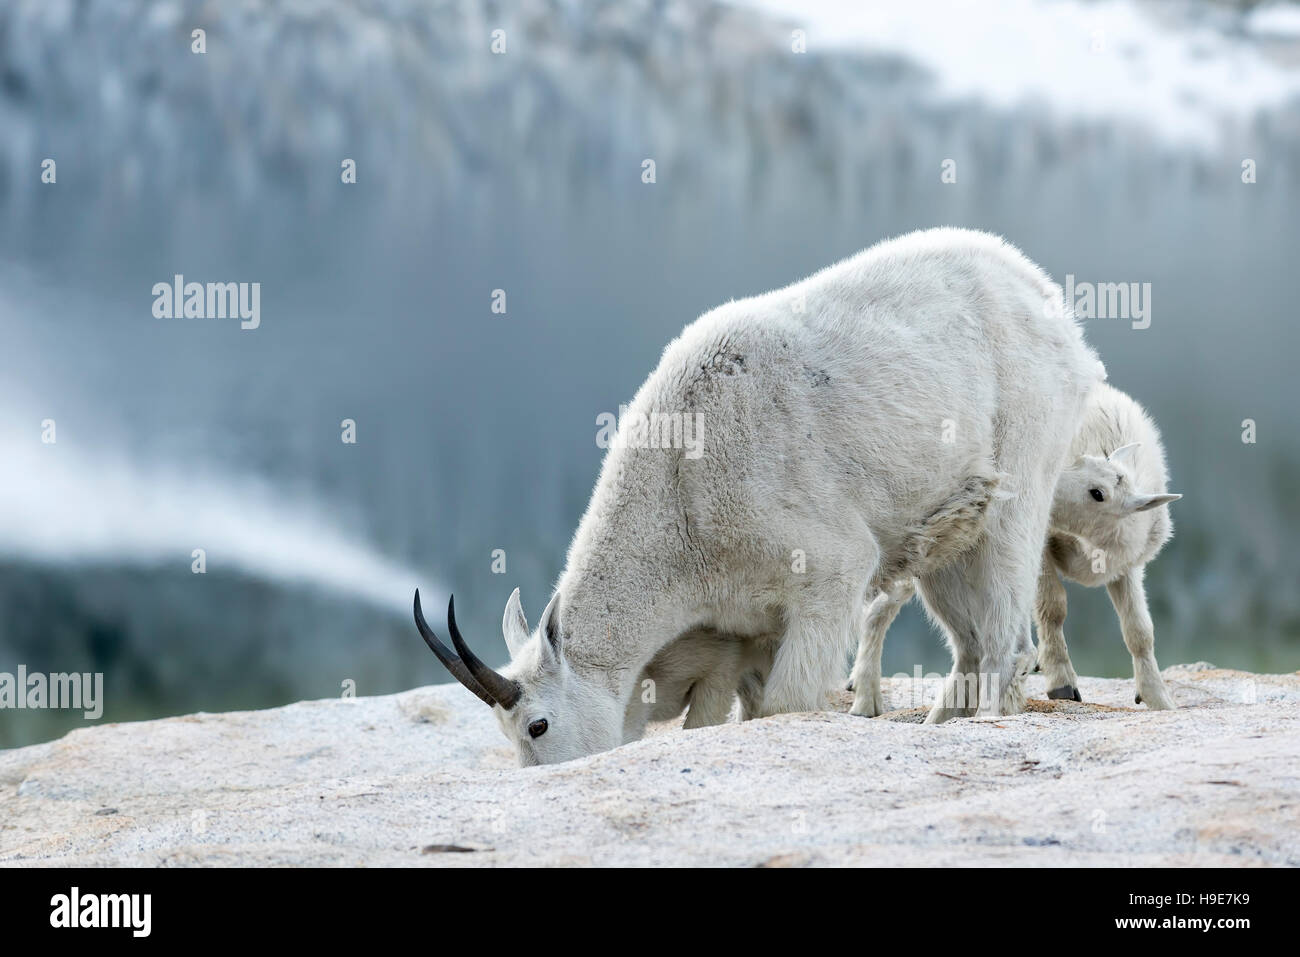 Mountain goat nanny nursing one of her kids, Wallowa Mountains, Oregon. - Stock Image